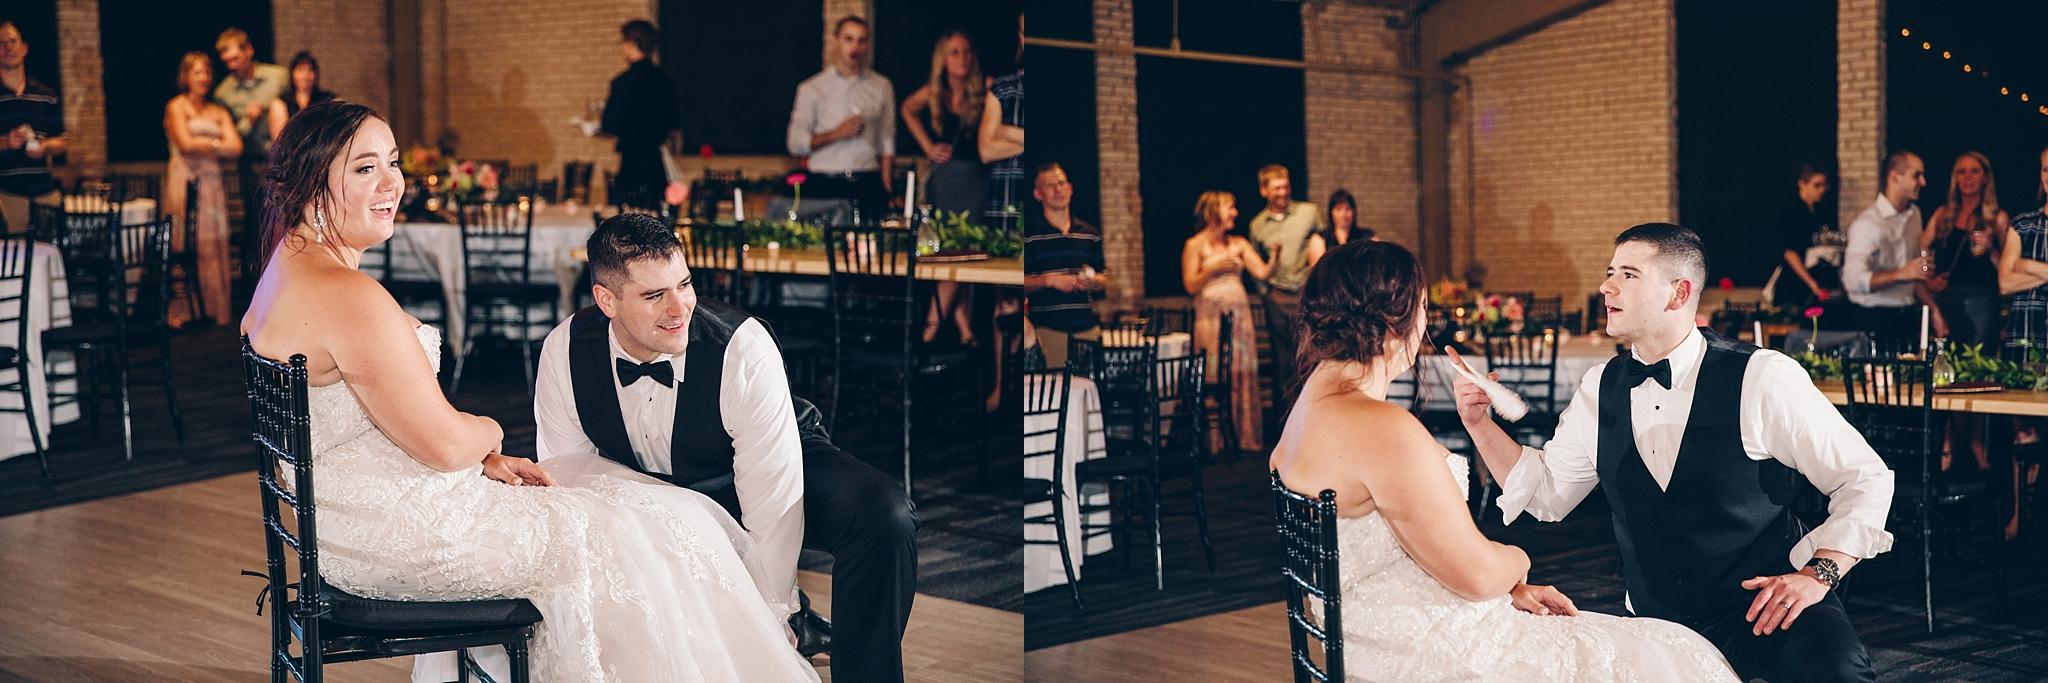 baker-lofts-holland-michigan-wedding-photographer_0413.jpg